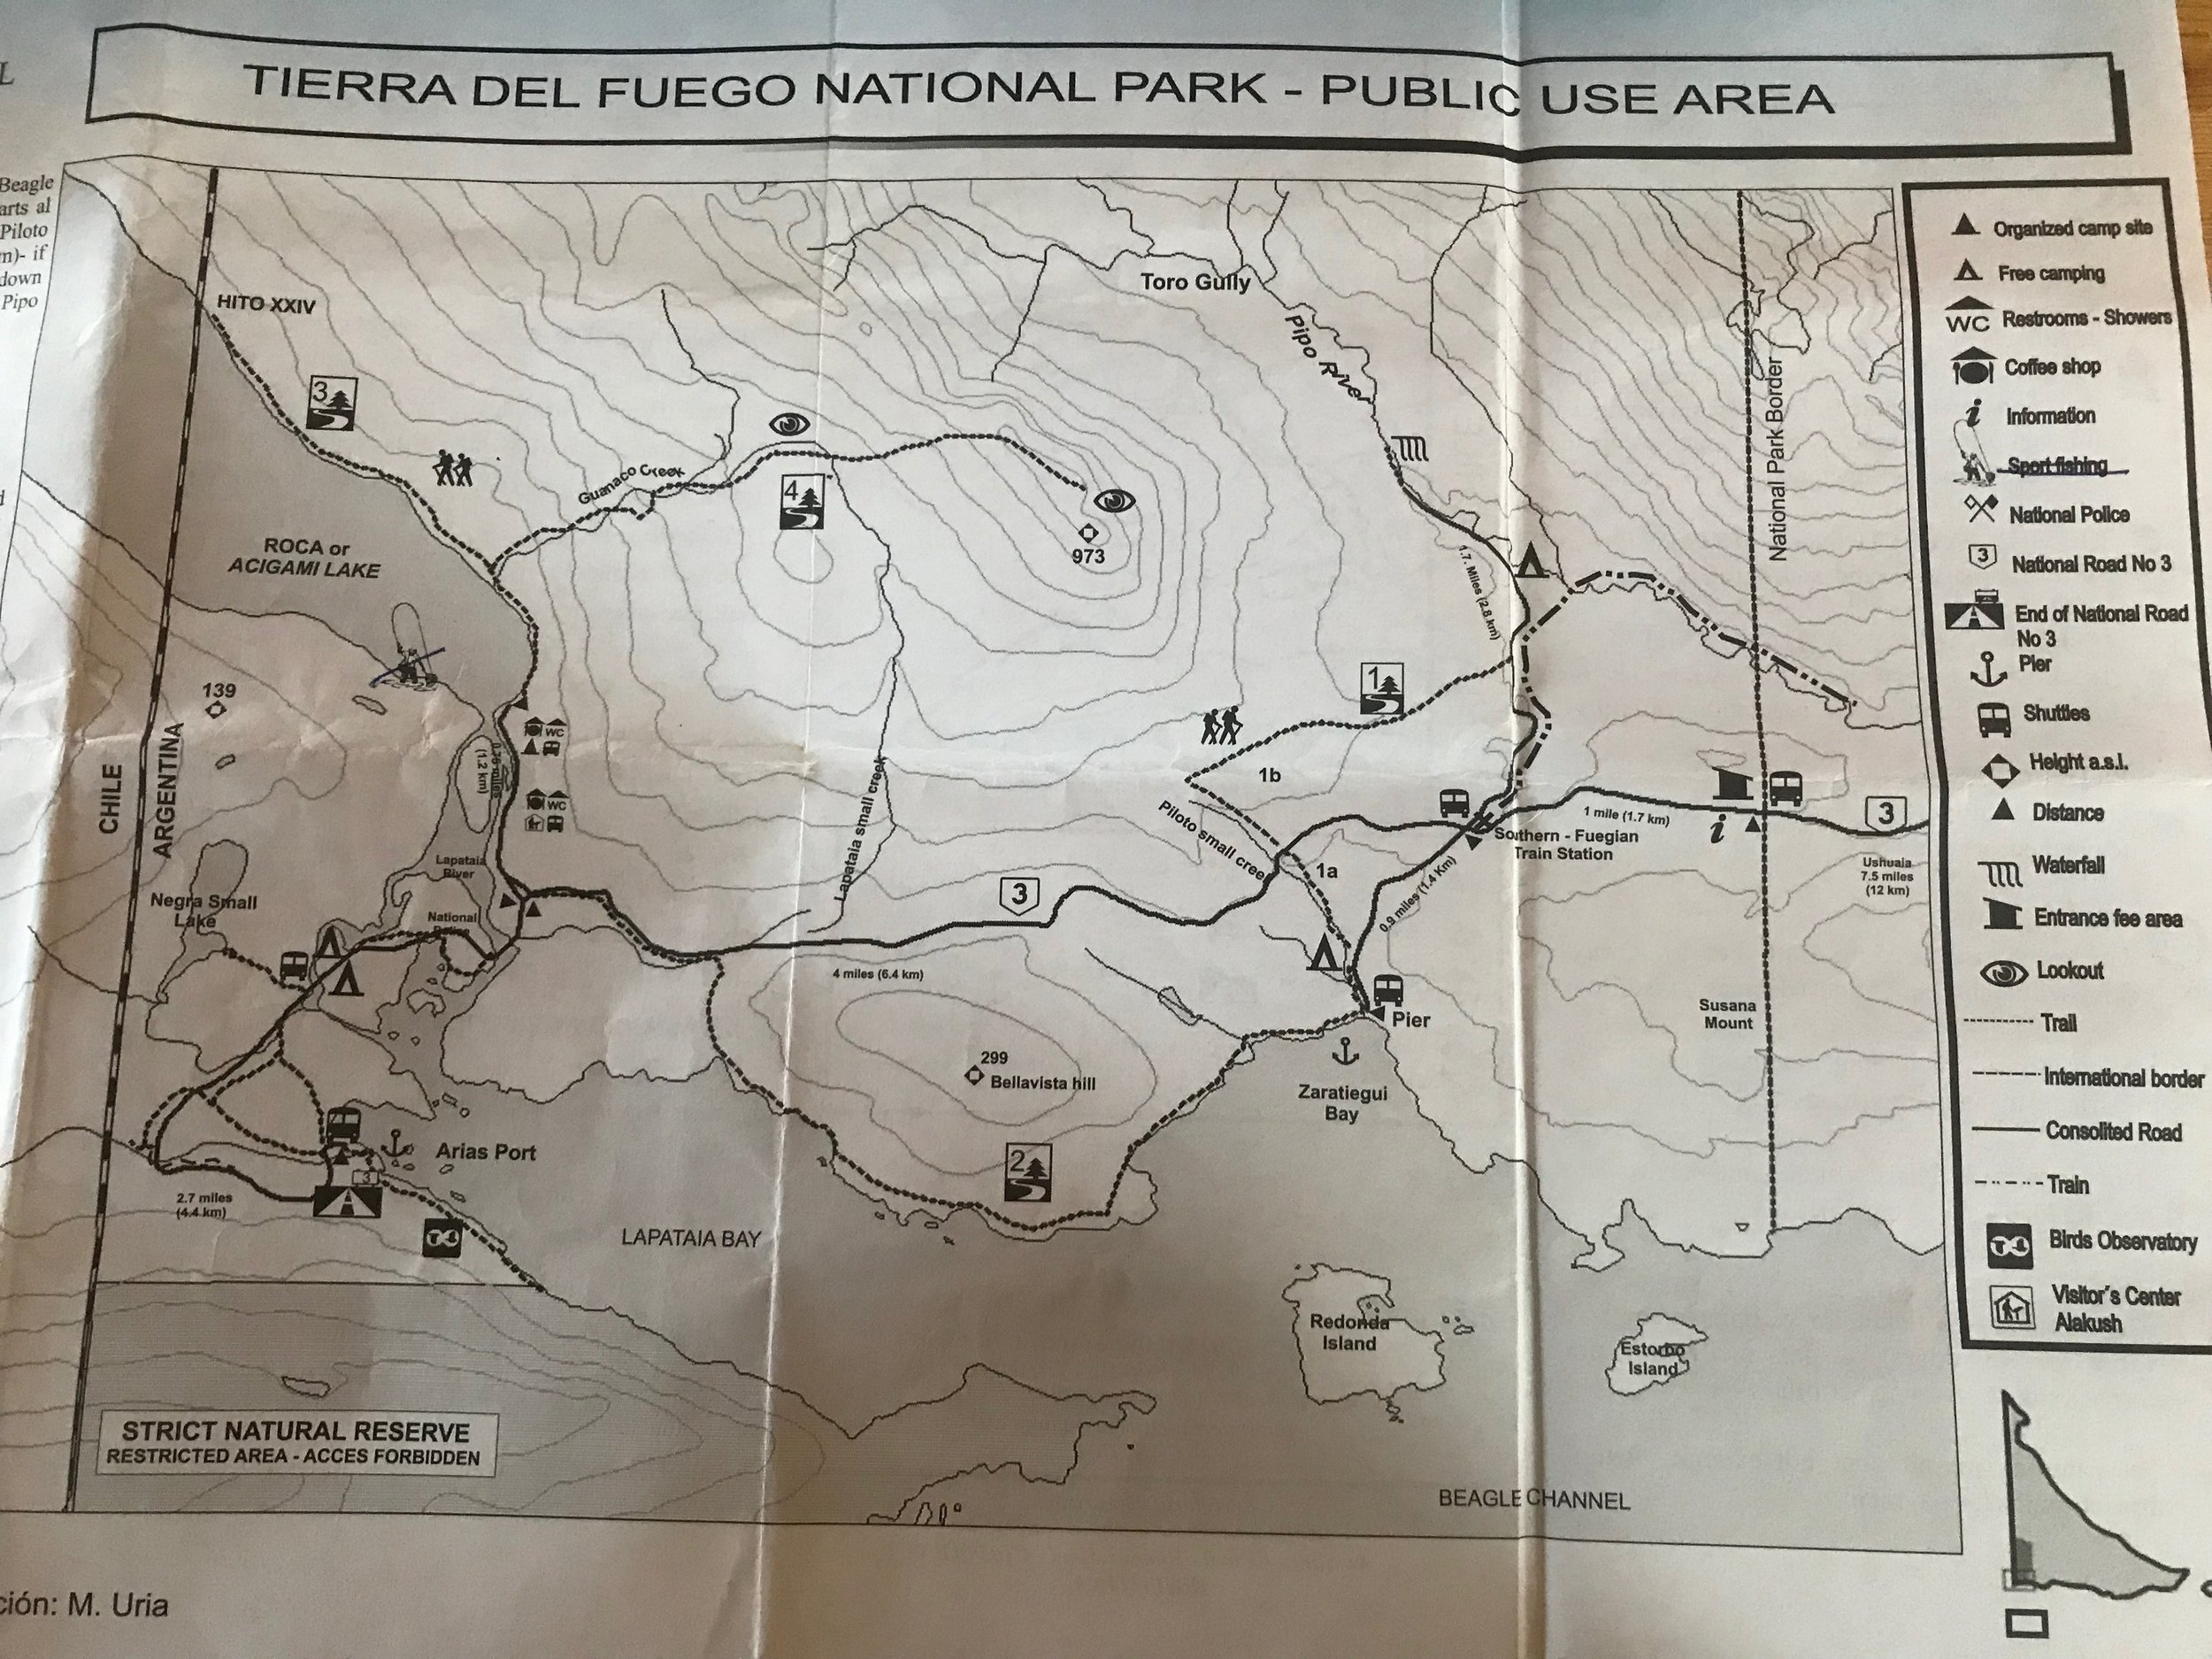 Ushuaia Argentina Tierra del Fuego National Park Map